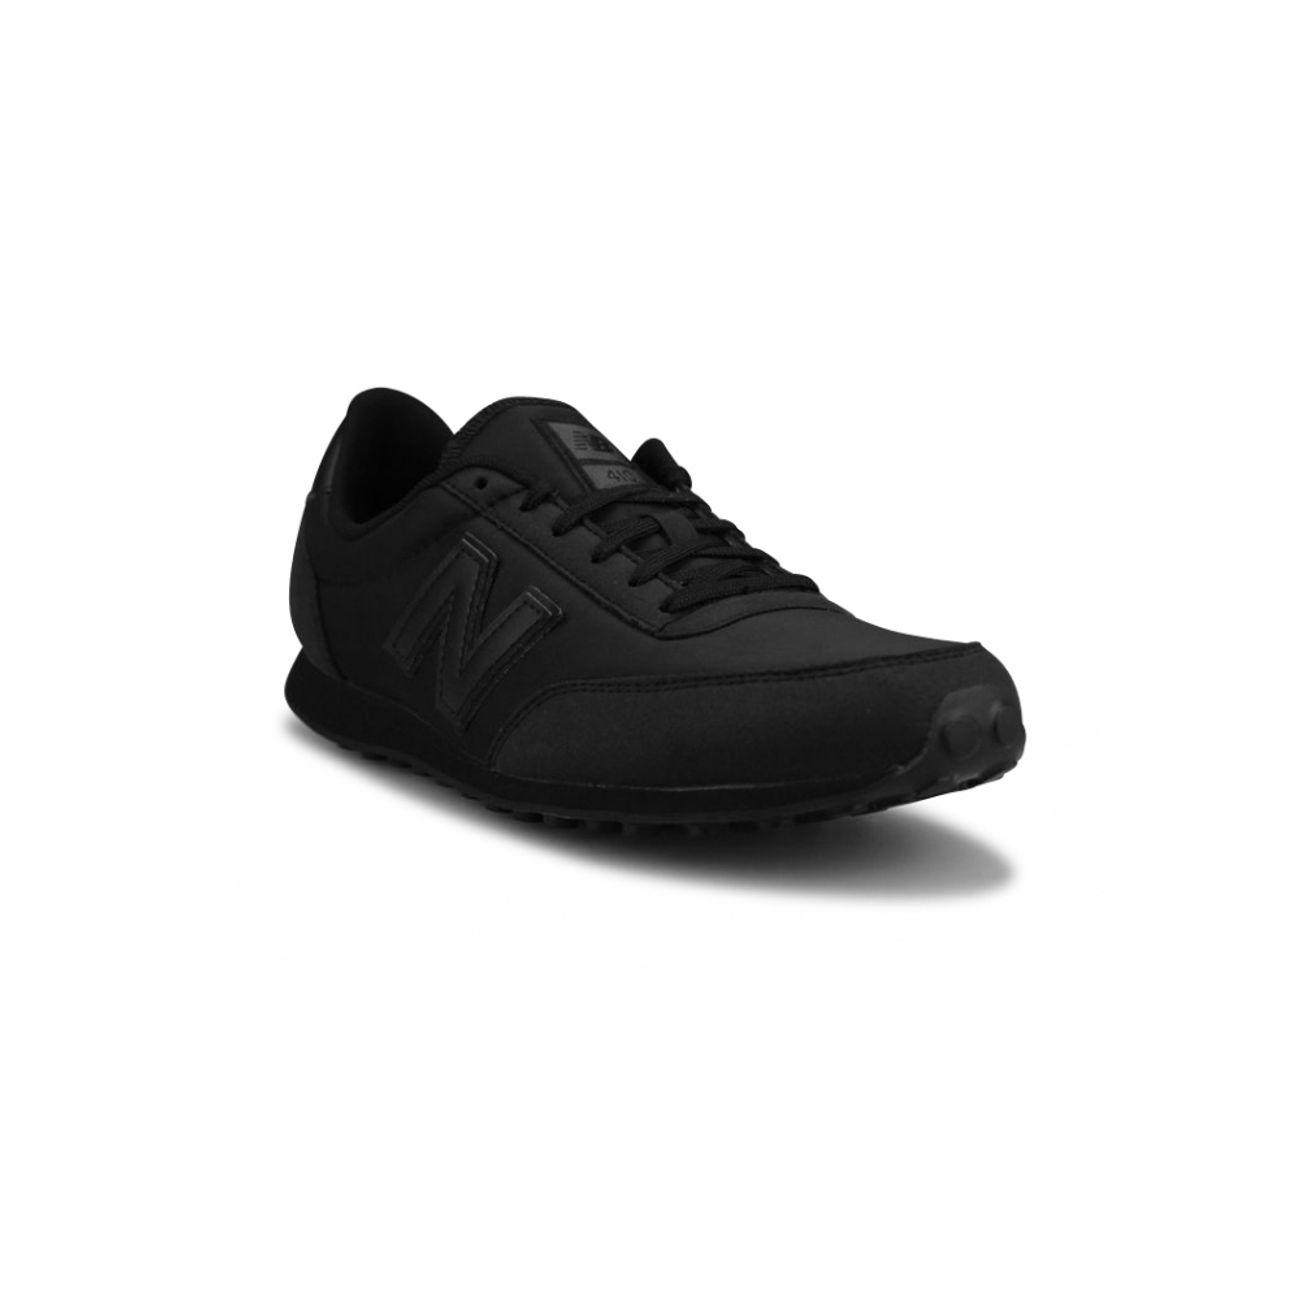 basket new balance homme 410 noire